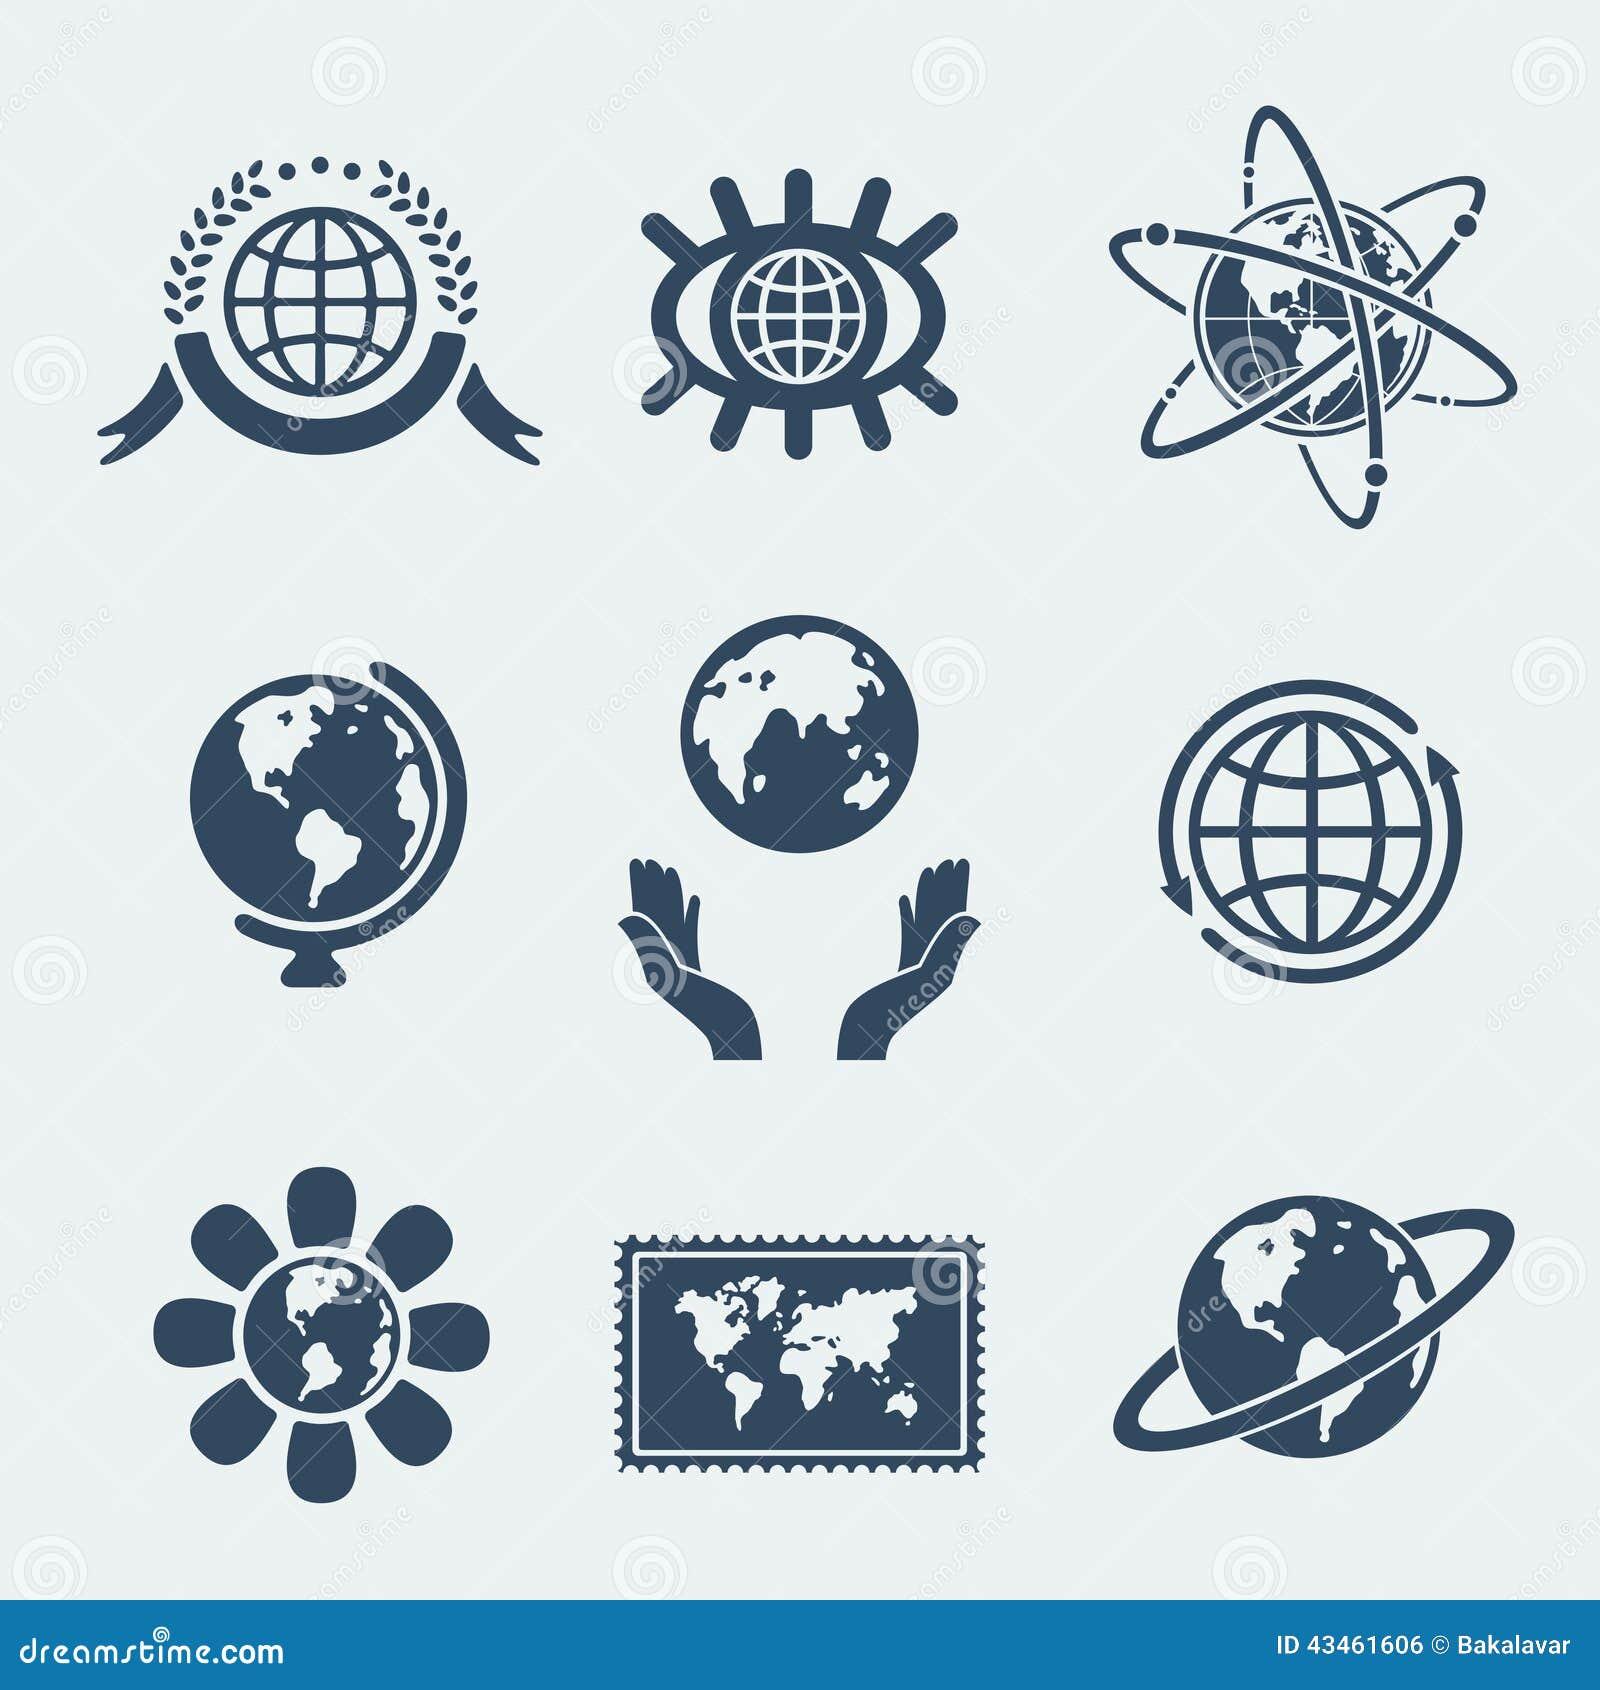 The planet mercury symbol blog post the nissan juke horoscope the planet mercury symbol buycottarizona Choice Image